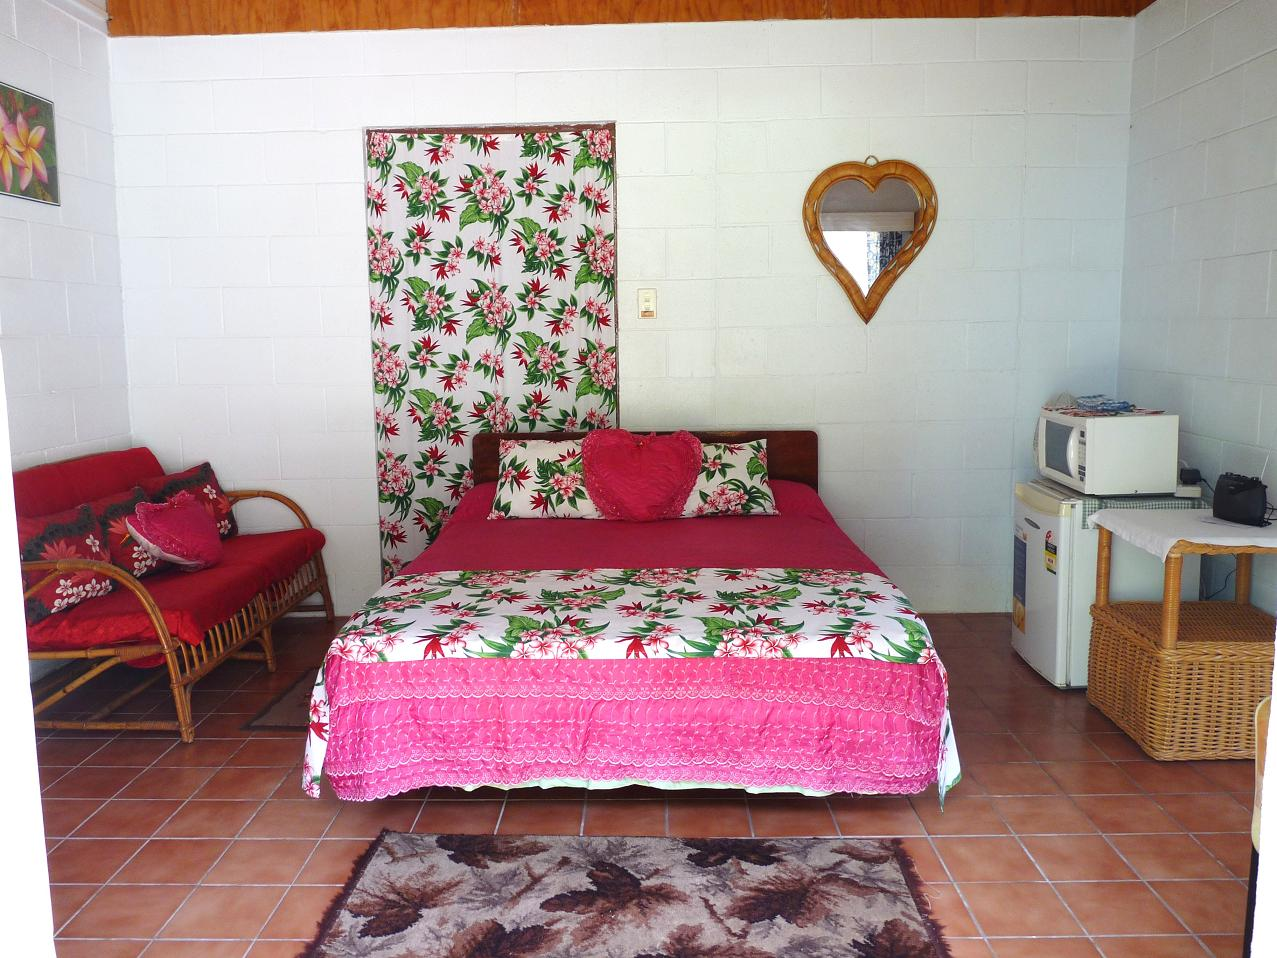 Vacances en Maison à louer à Rarotonga,  Avatiu, Atupa, Cook Islands